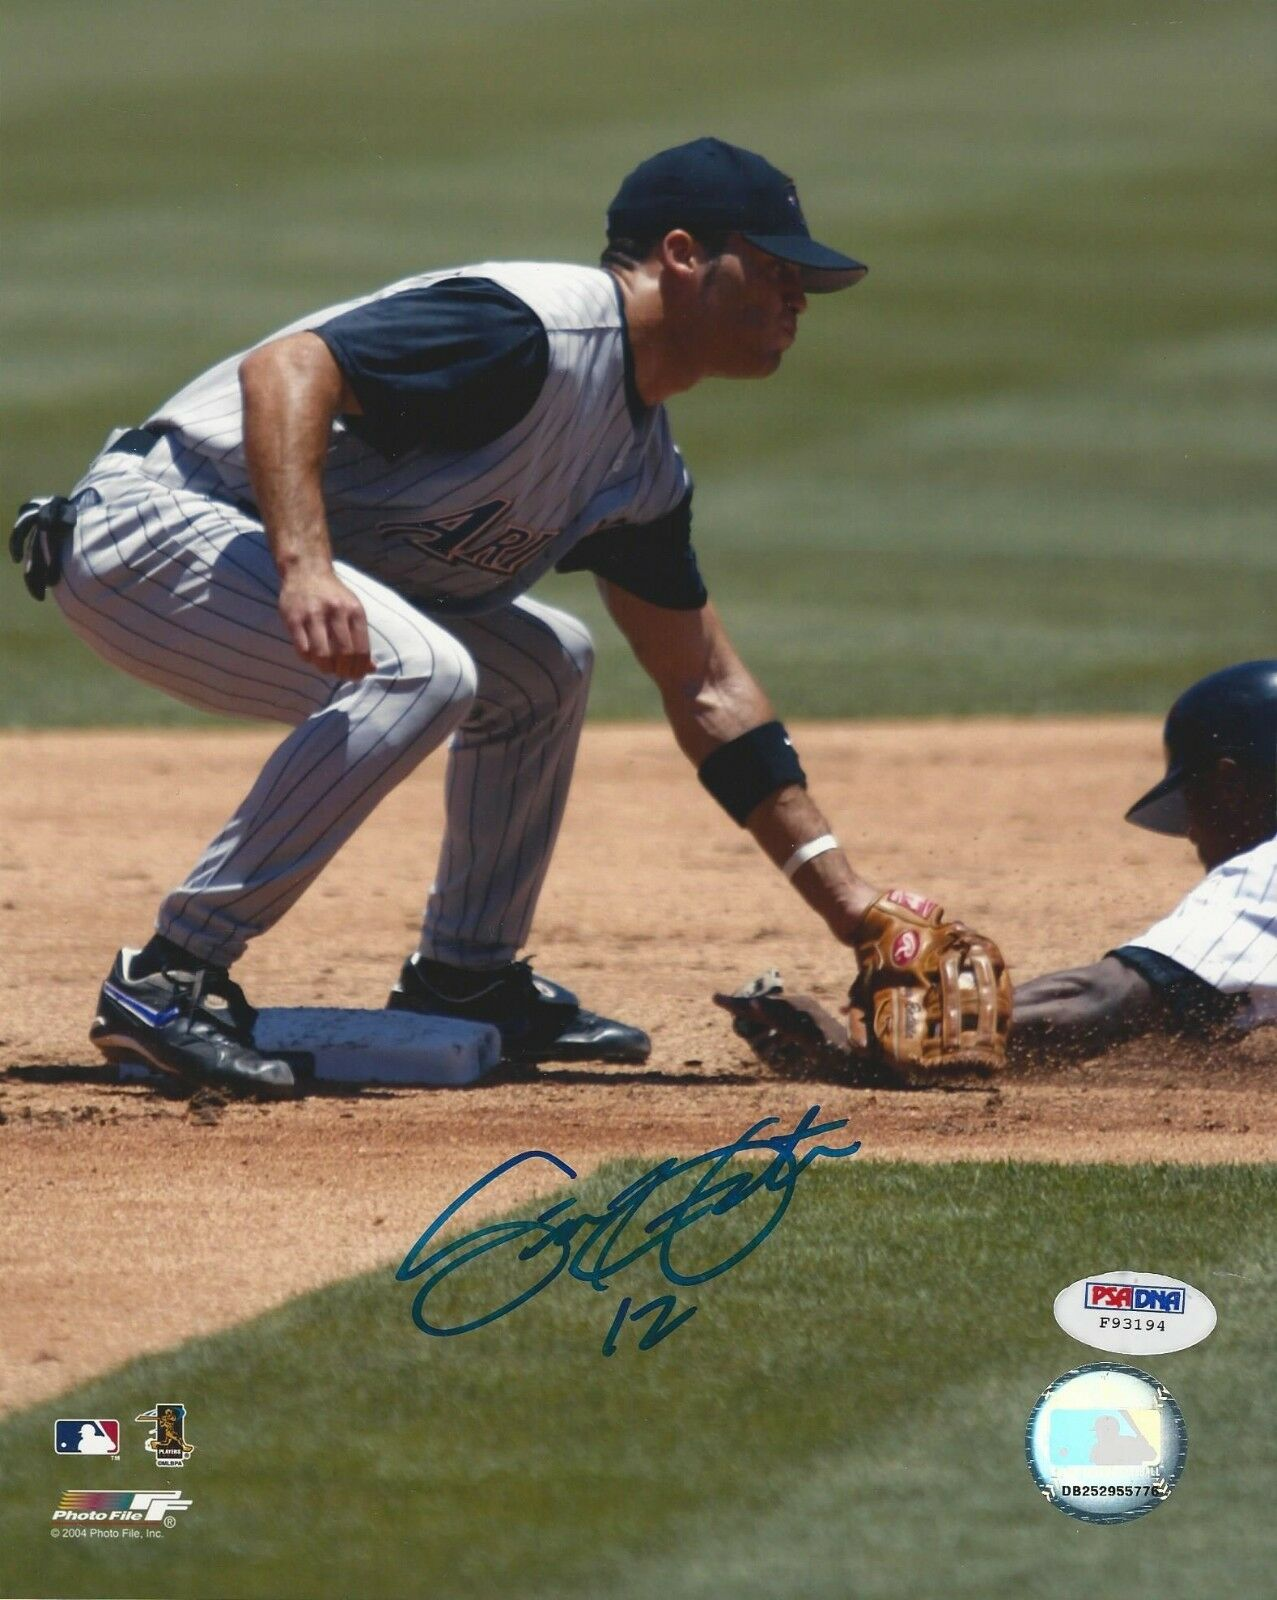 Scott Hairston Arizona Diamondbacks signed 8x10 photo PSA/DNA #F93194